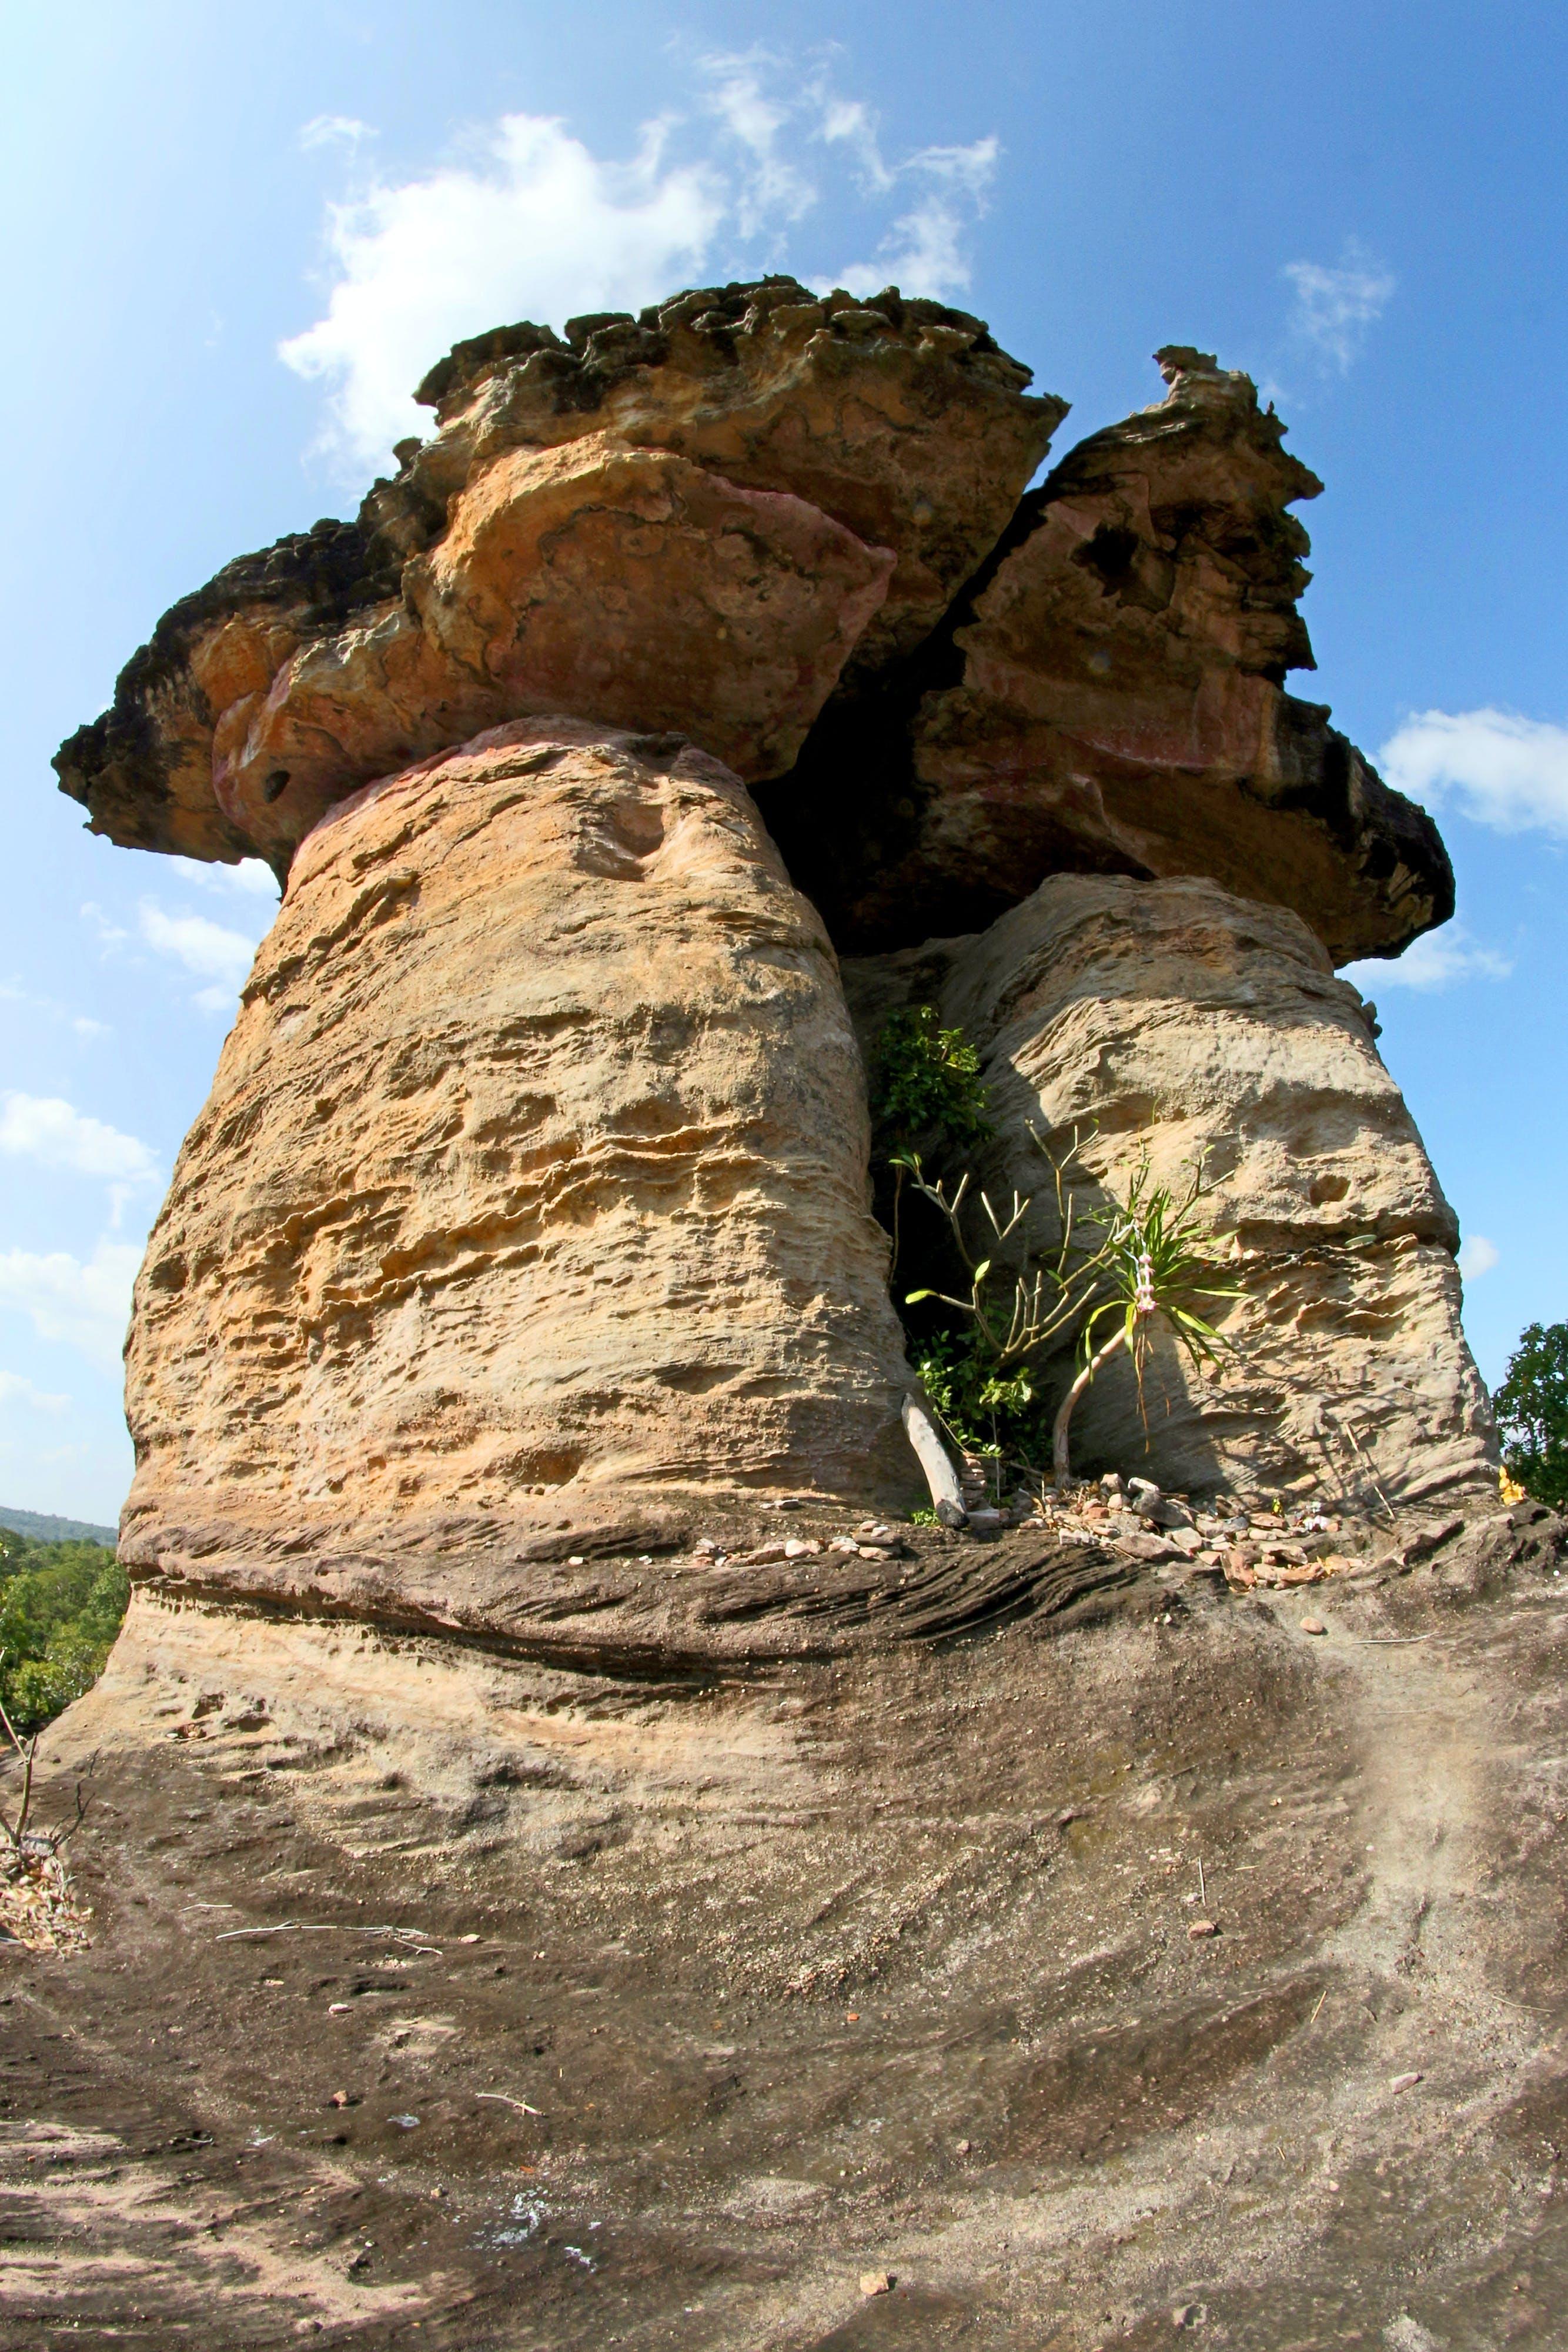 Rock Monolith Under Blue Sky